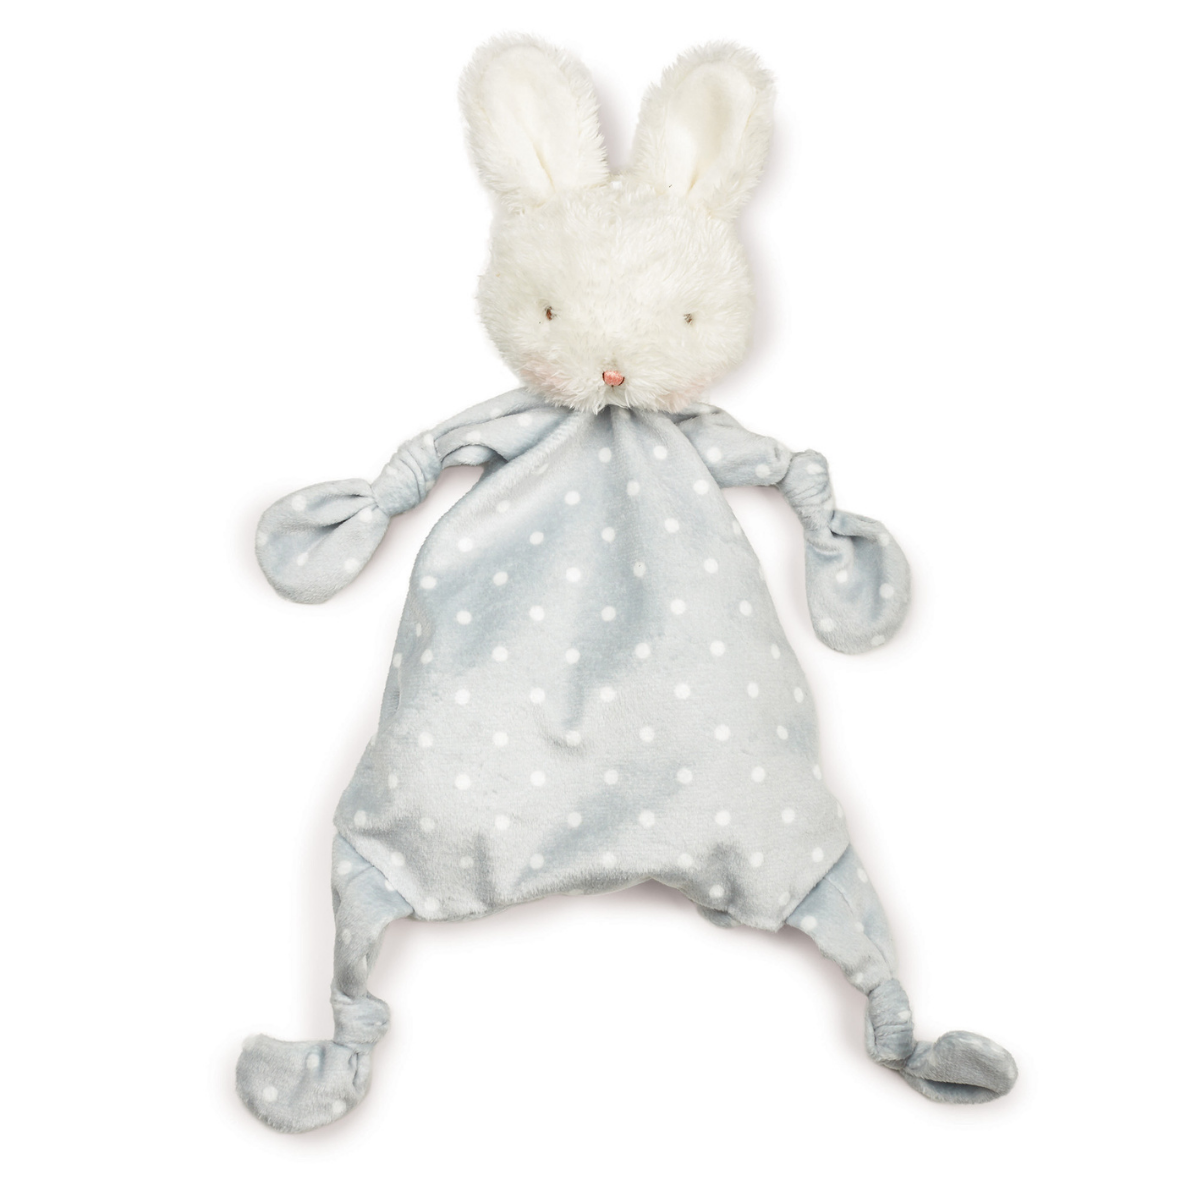 Bloom Bunny Knotty Friend